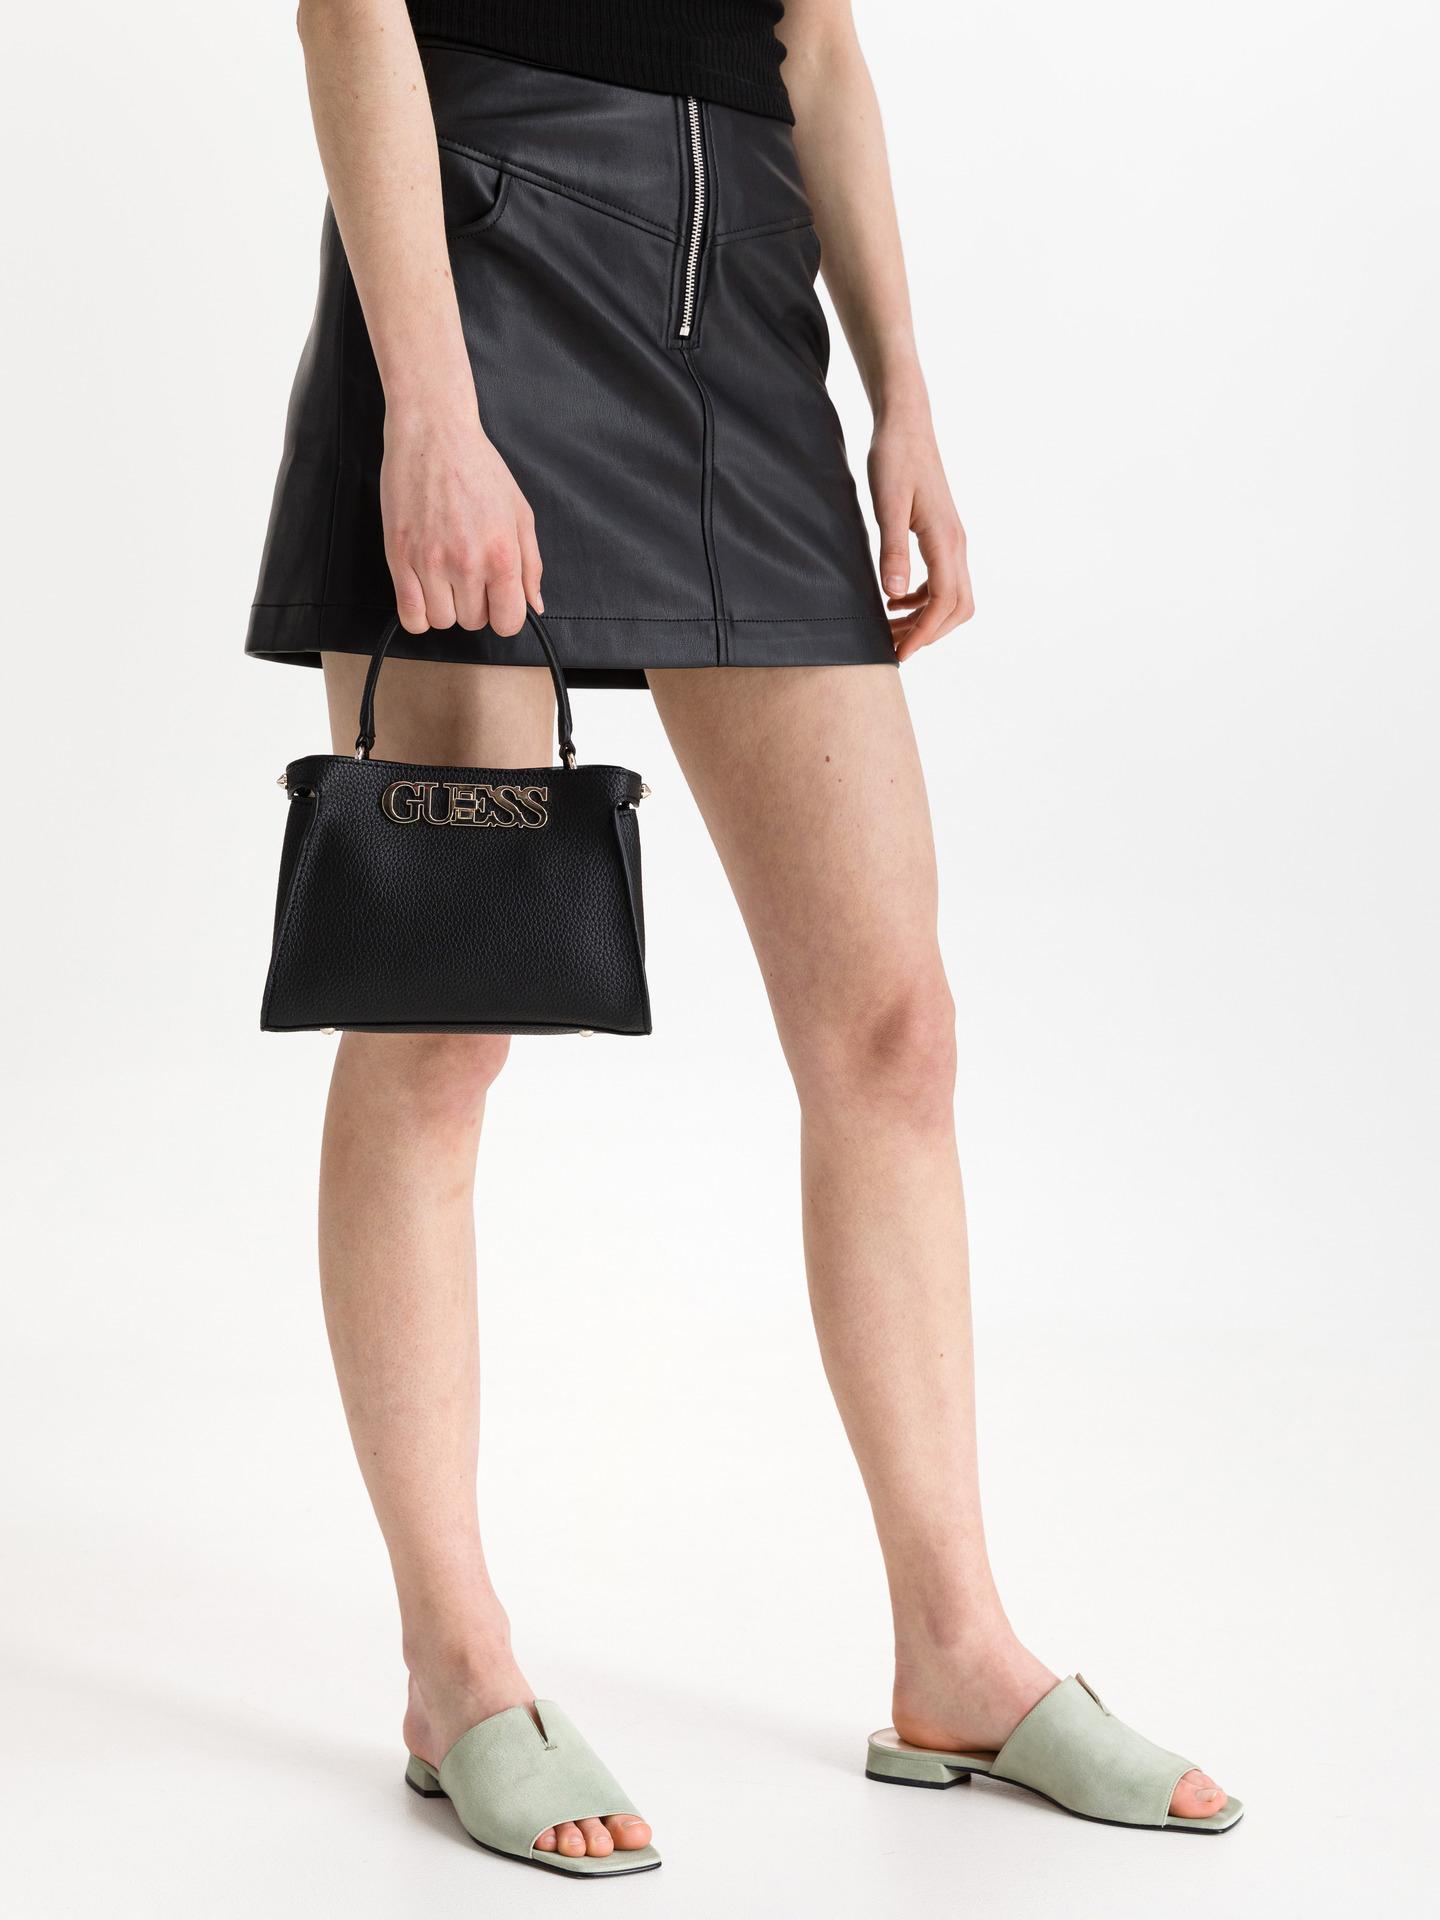 Guess černé kabelka Uptown Chic Small